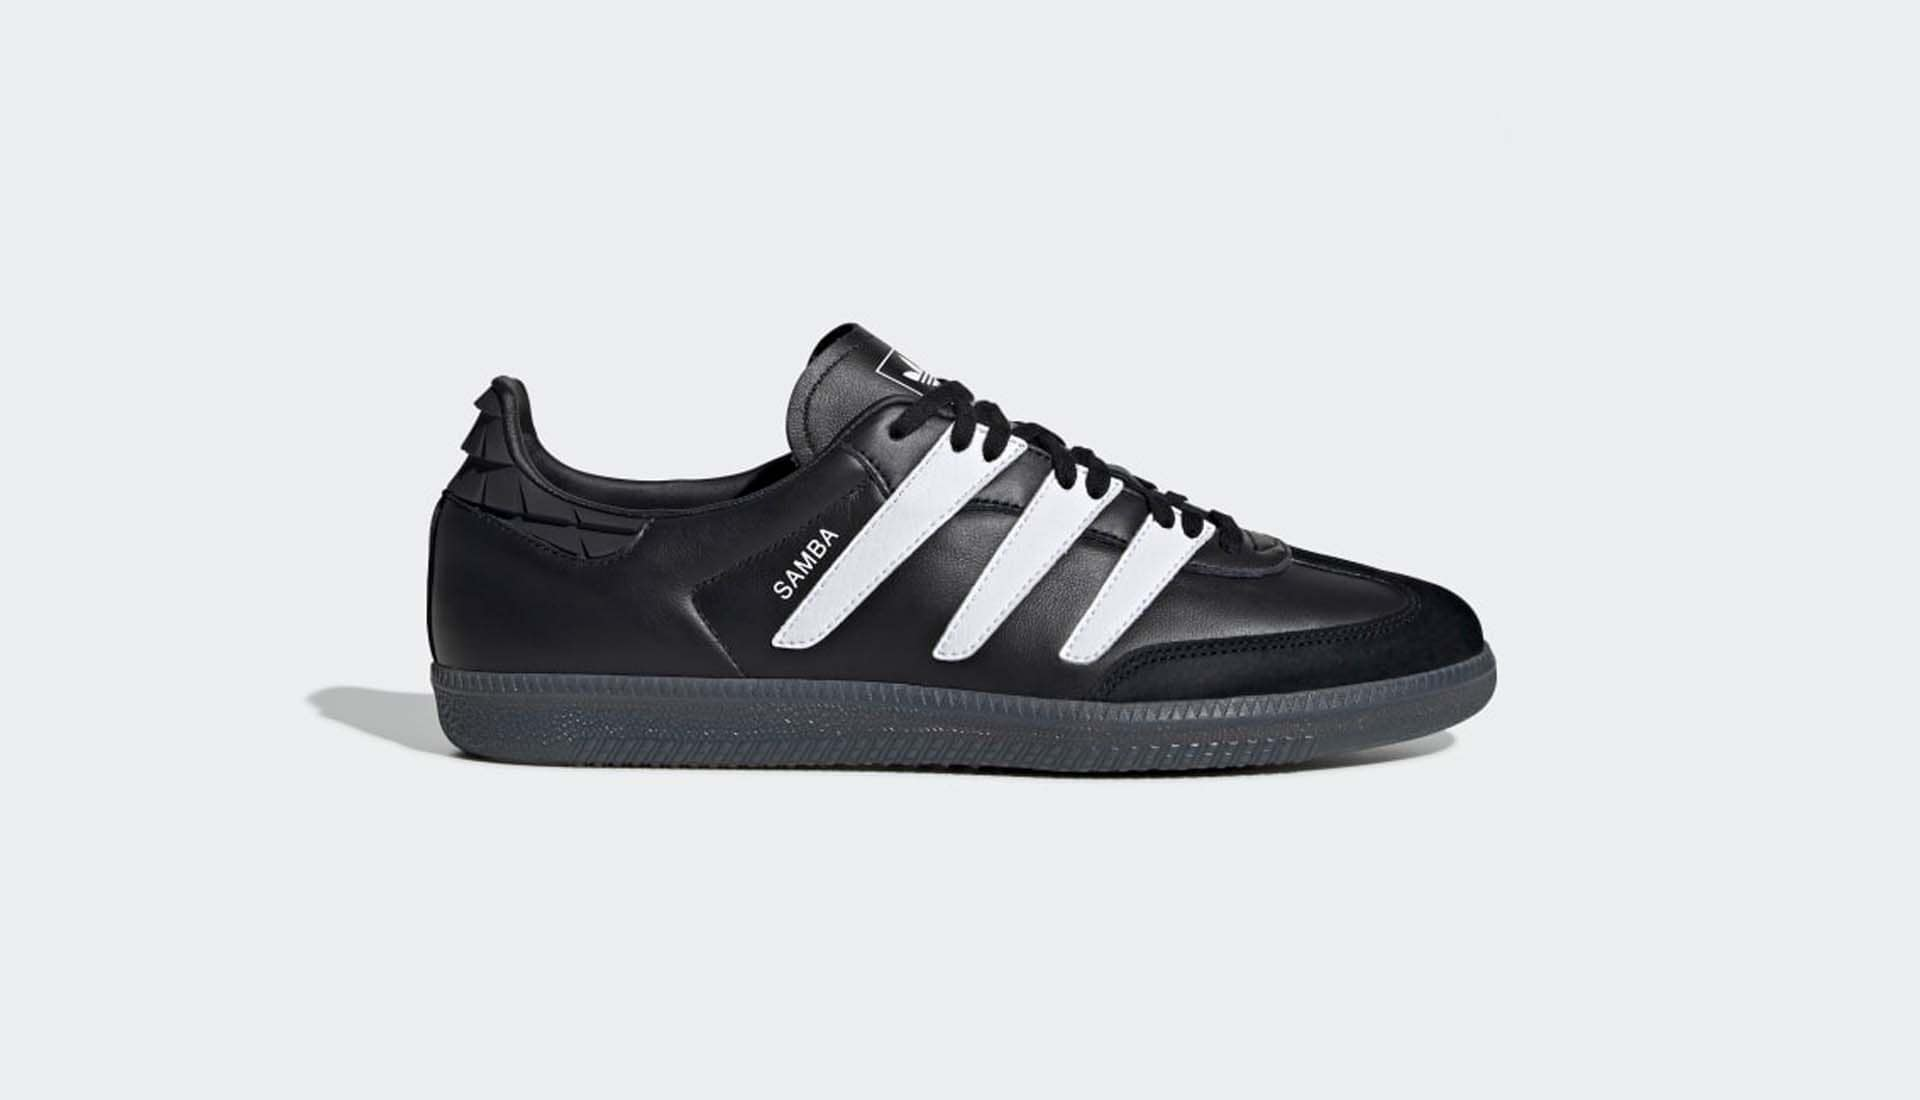 adidas Release The Predator-Infused Samba OG - SoccerBible